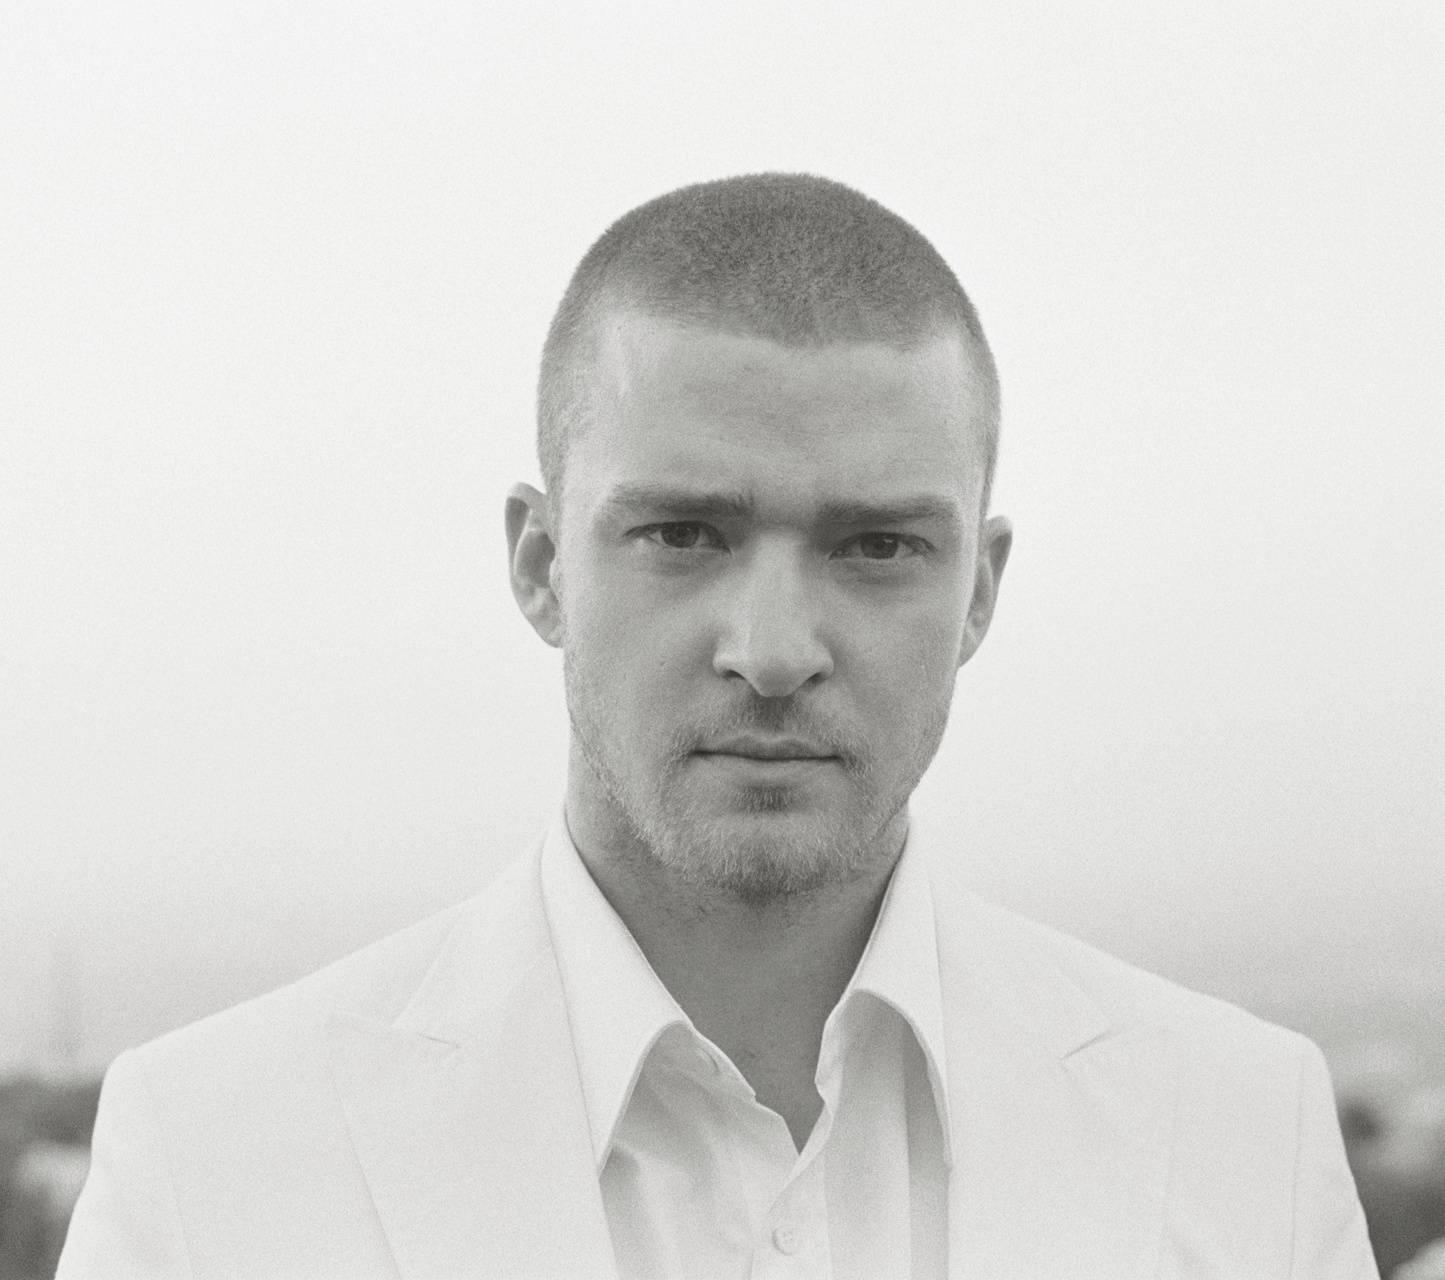 Justin Timberlake Wallpaper By Tedo9315 8b Free On Zedge